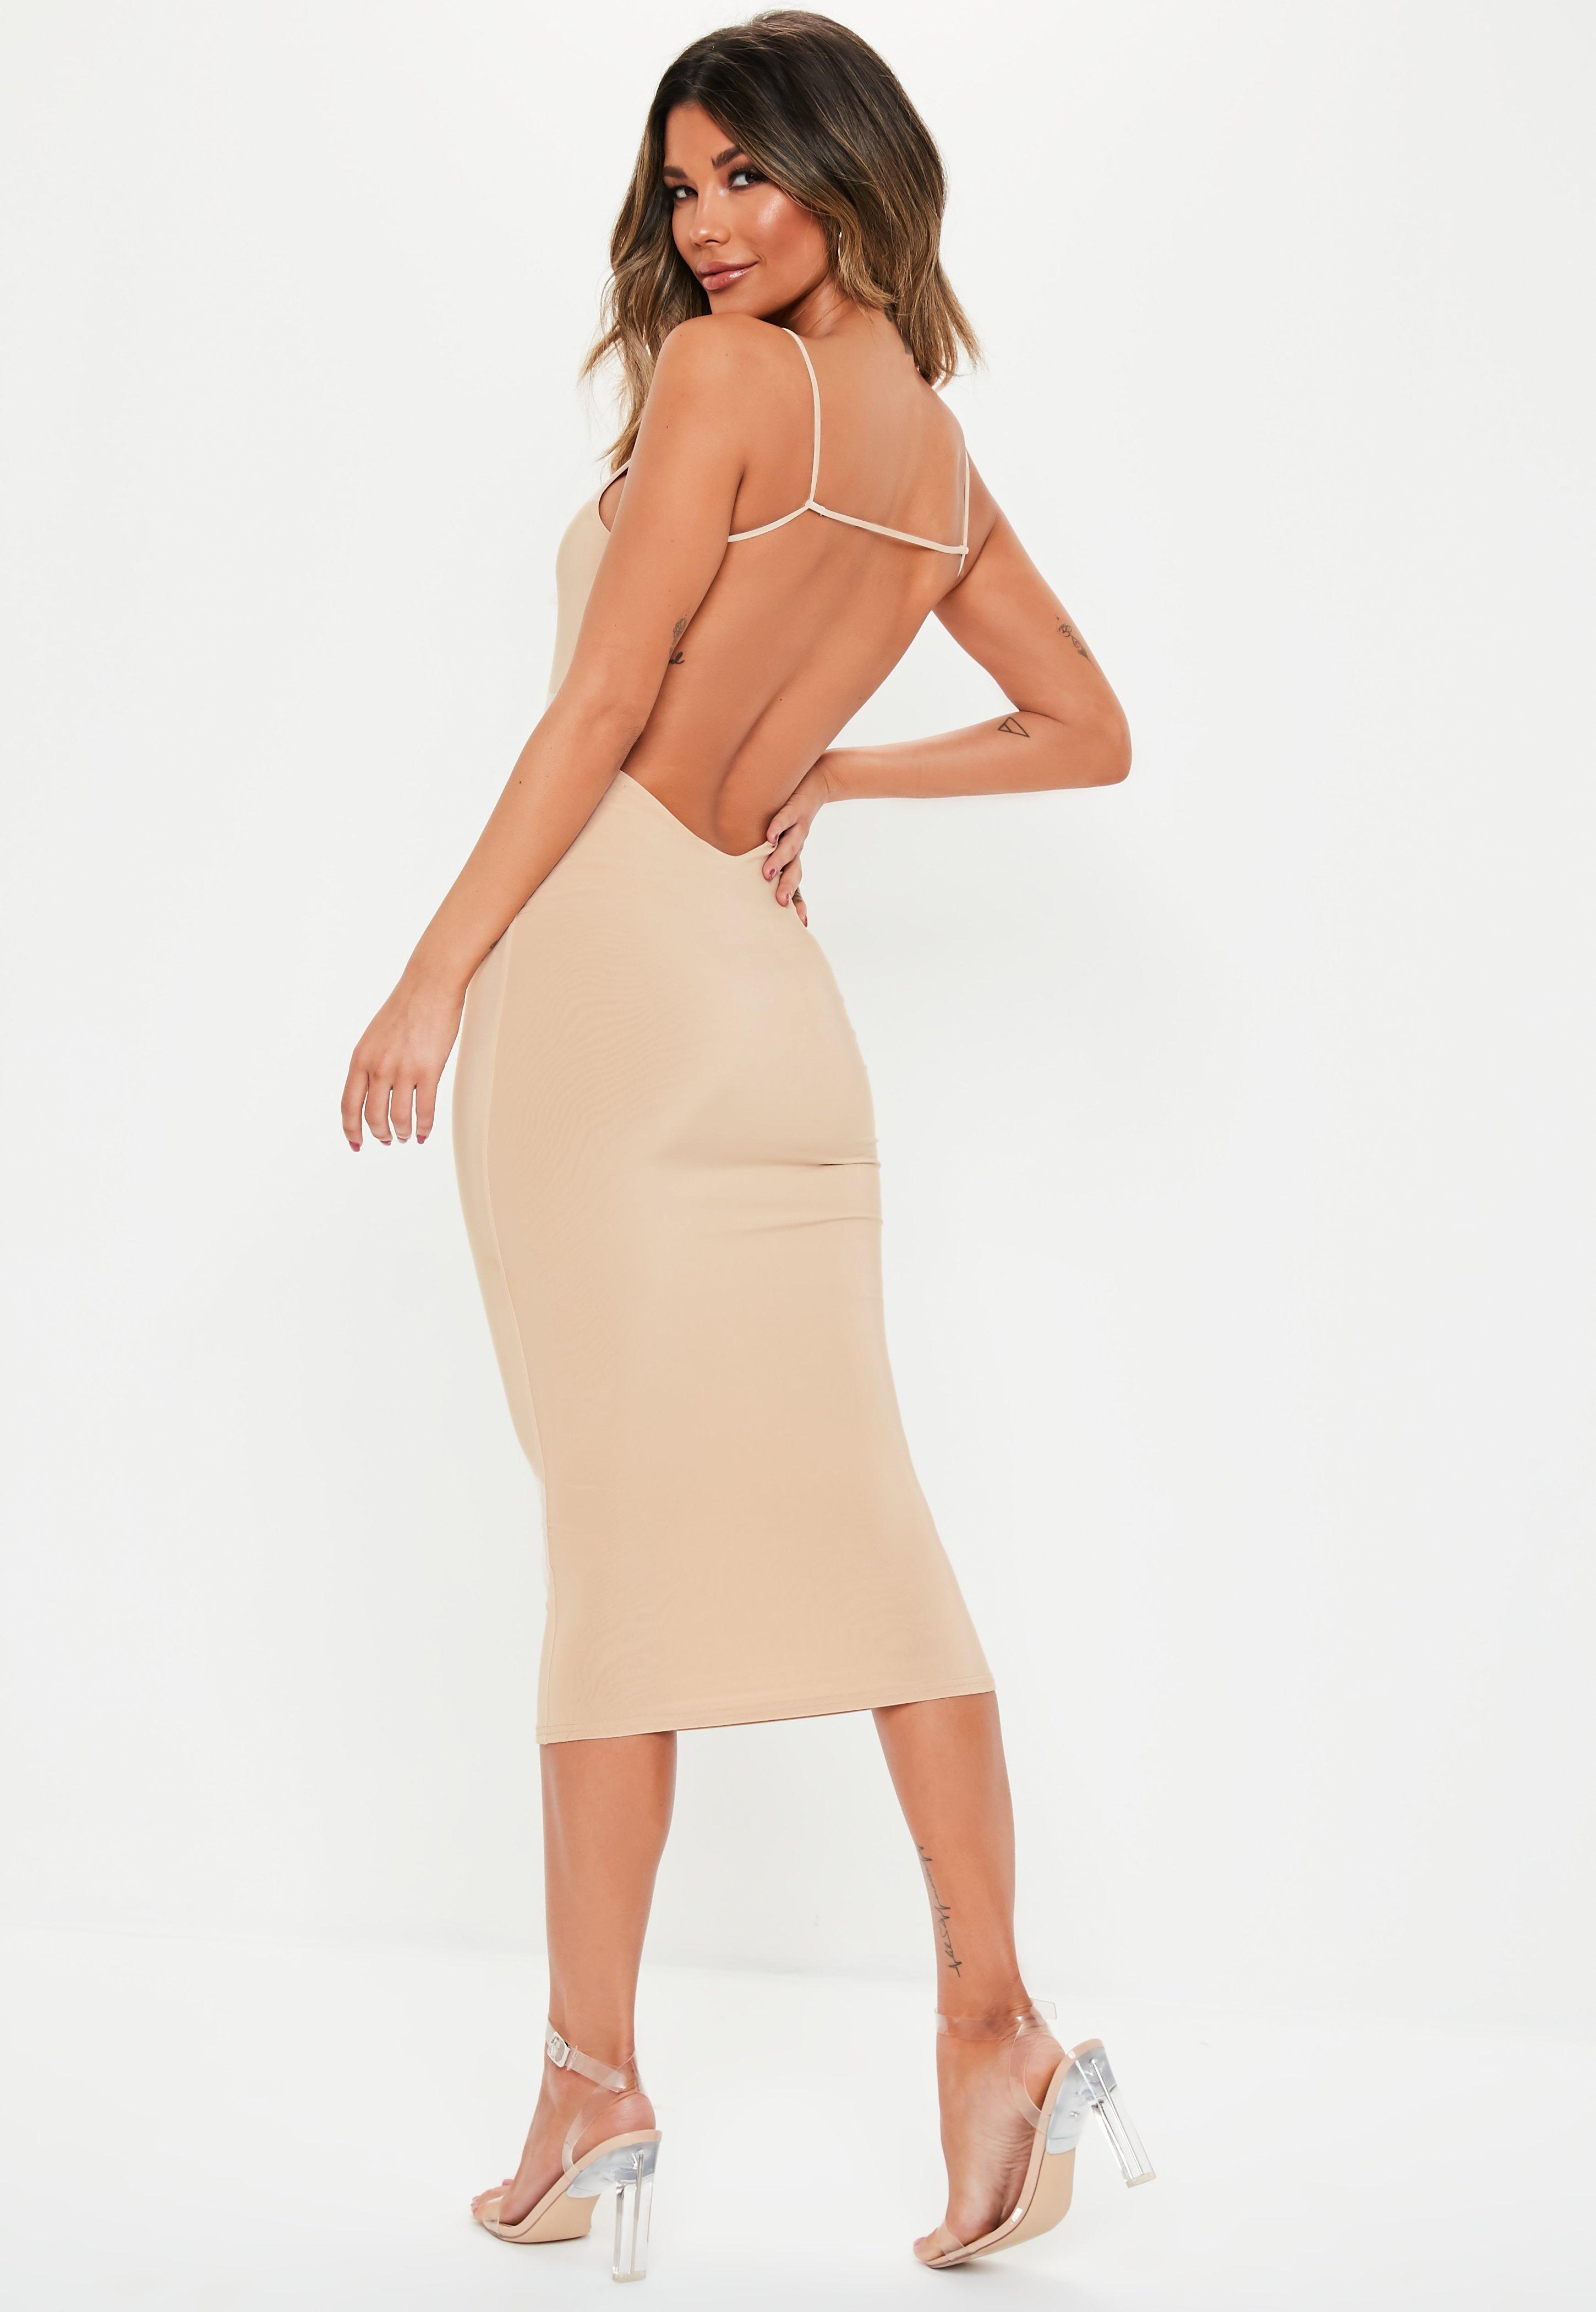 83d1cdf593 Backless Dresses